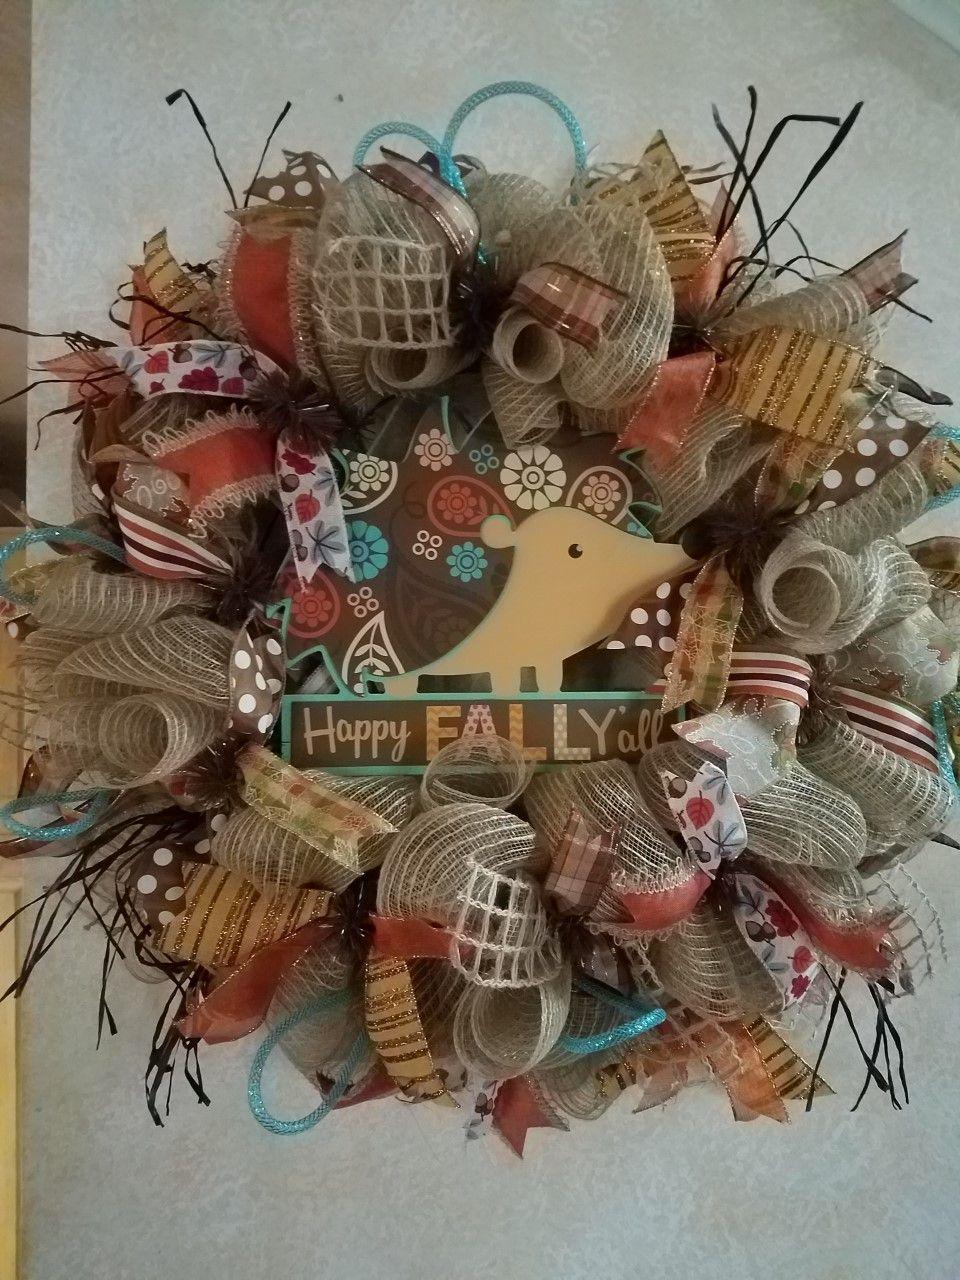 "Happy Fall Y'all Hedgehog 26"" Wreath for sale on Etsy by"